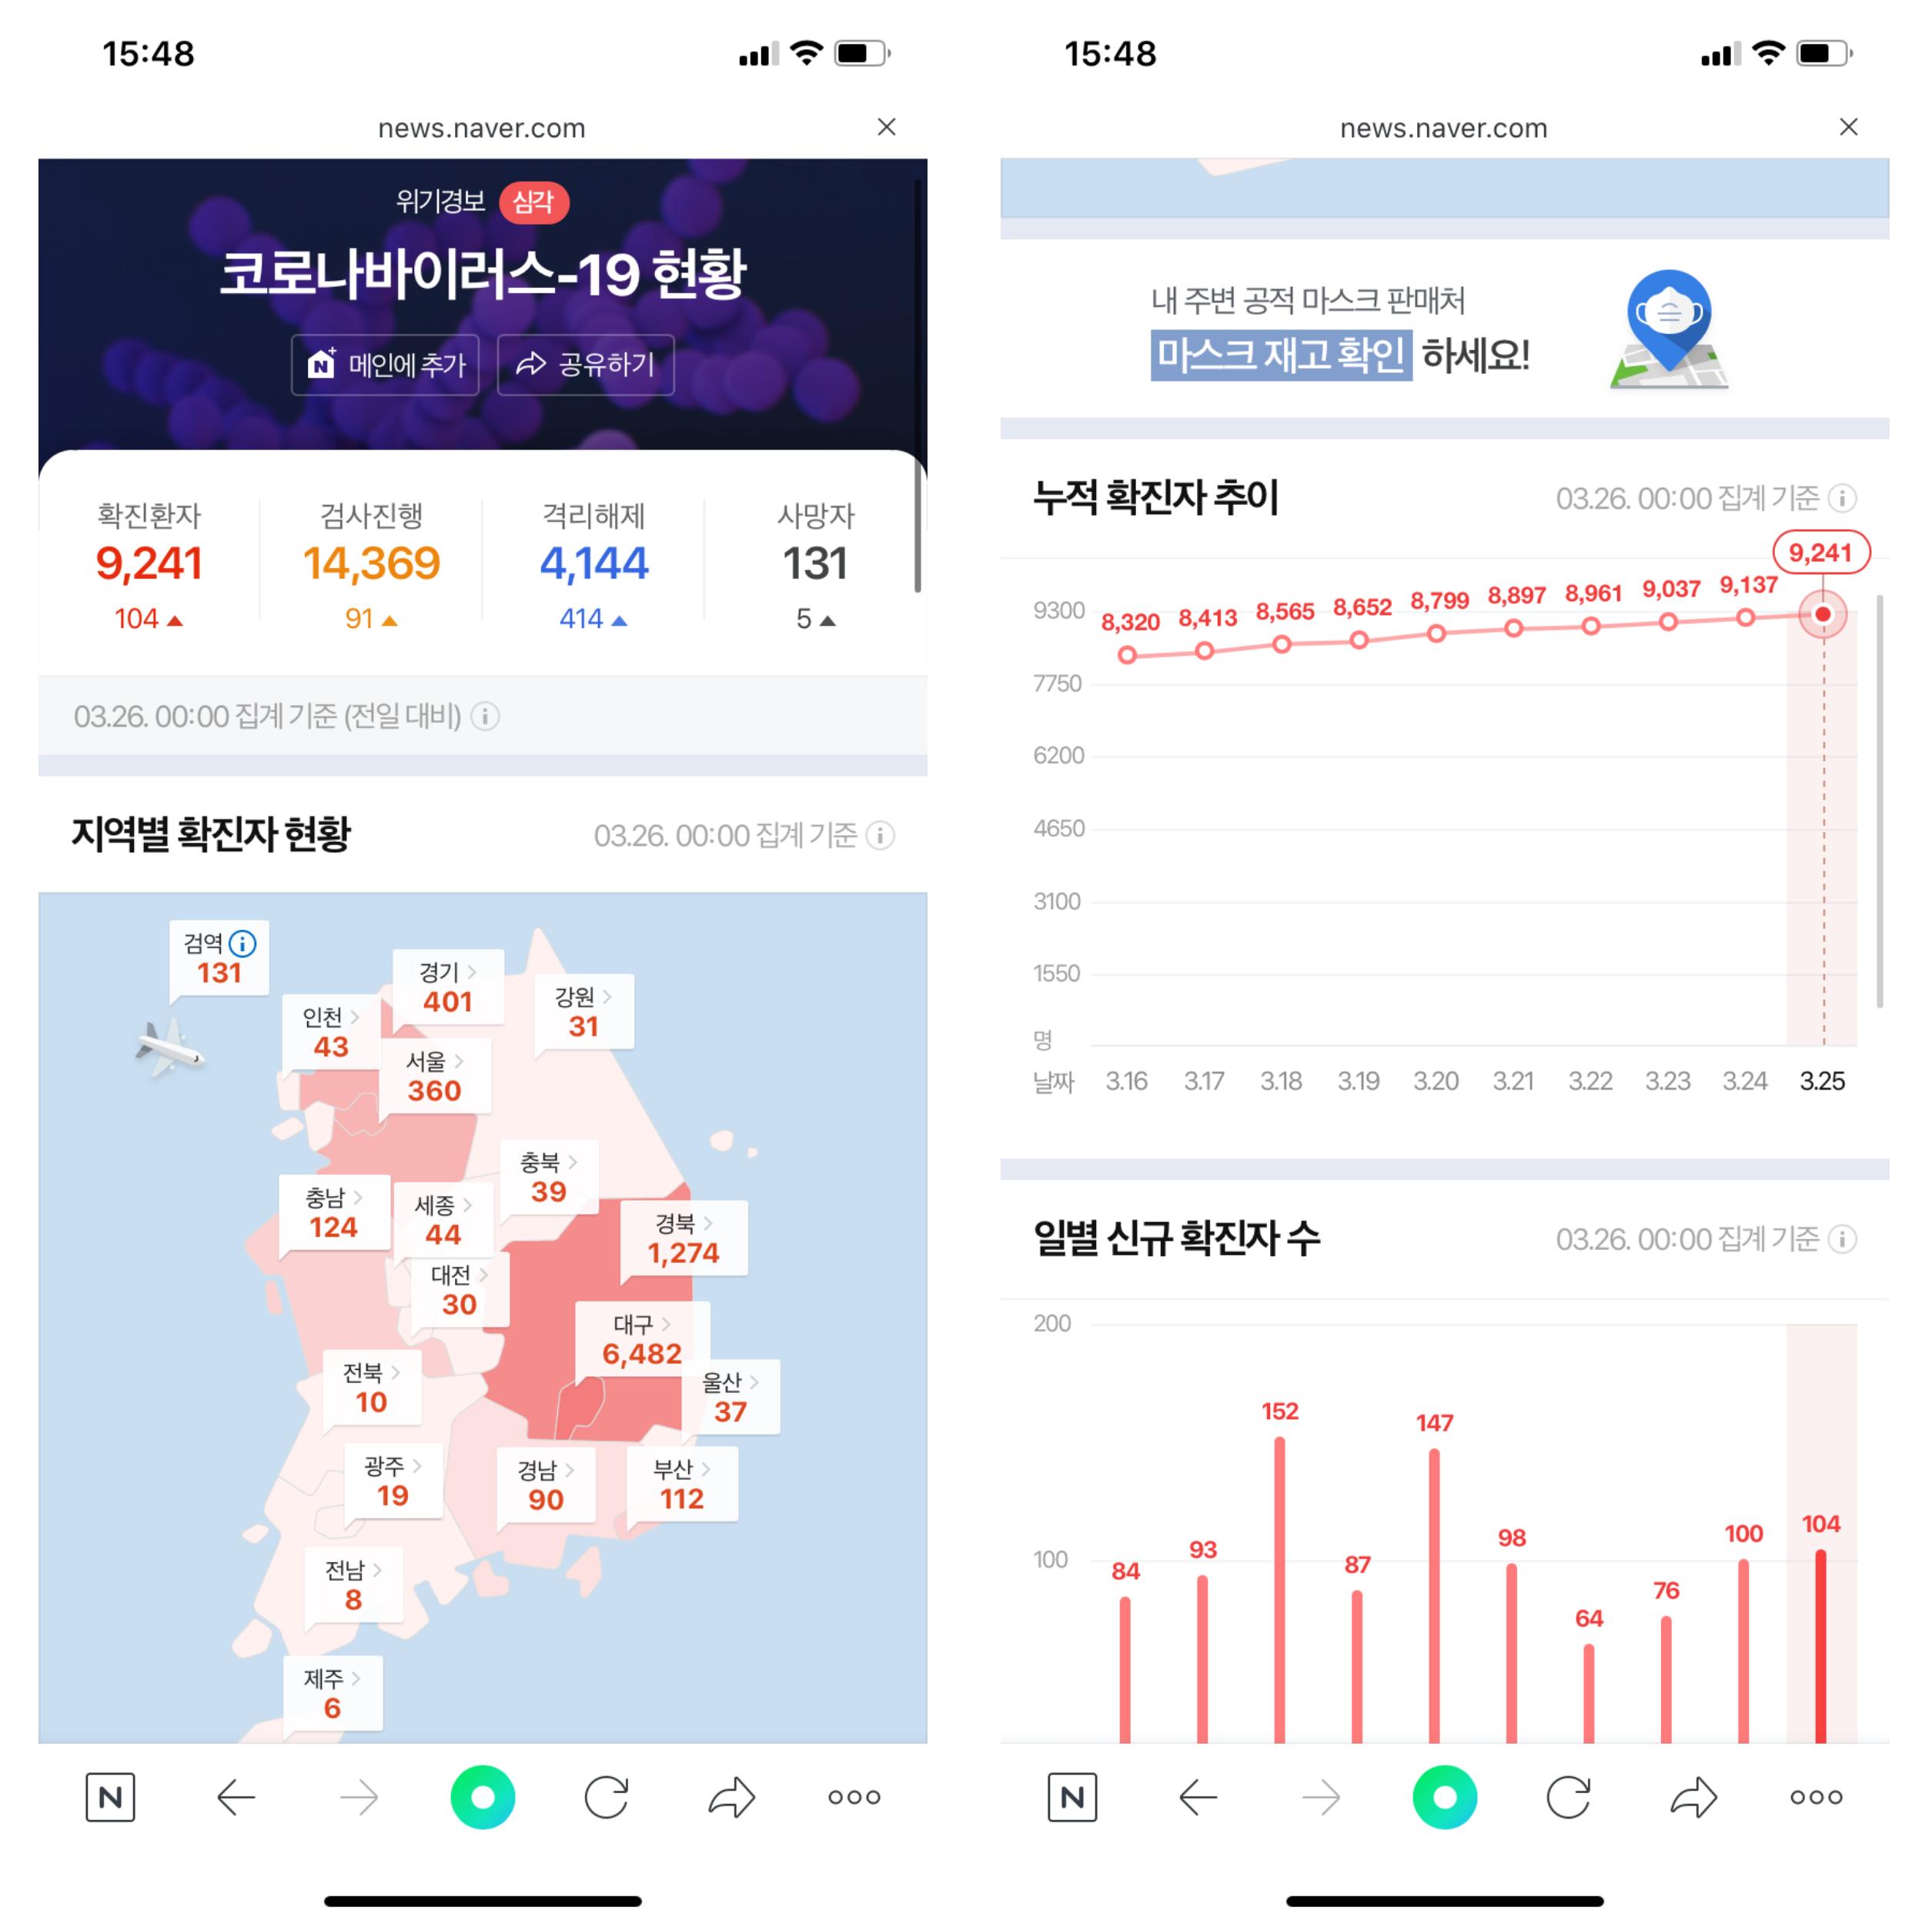 naver news coronavirus statistics mobile app